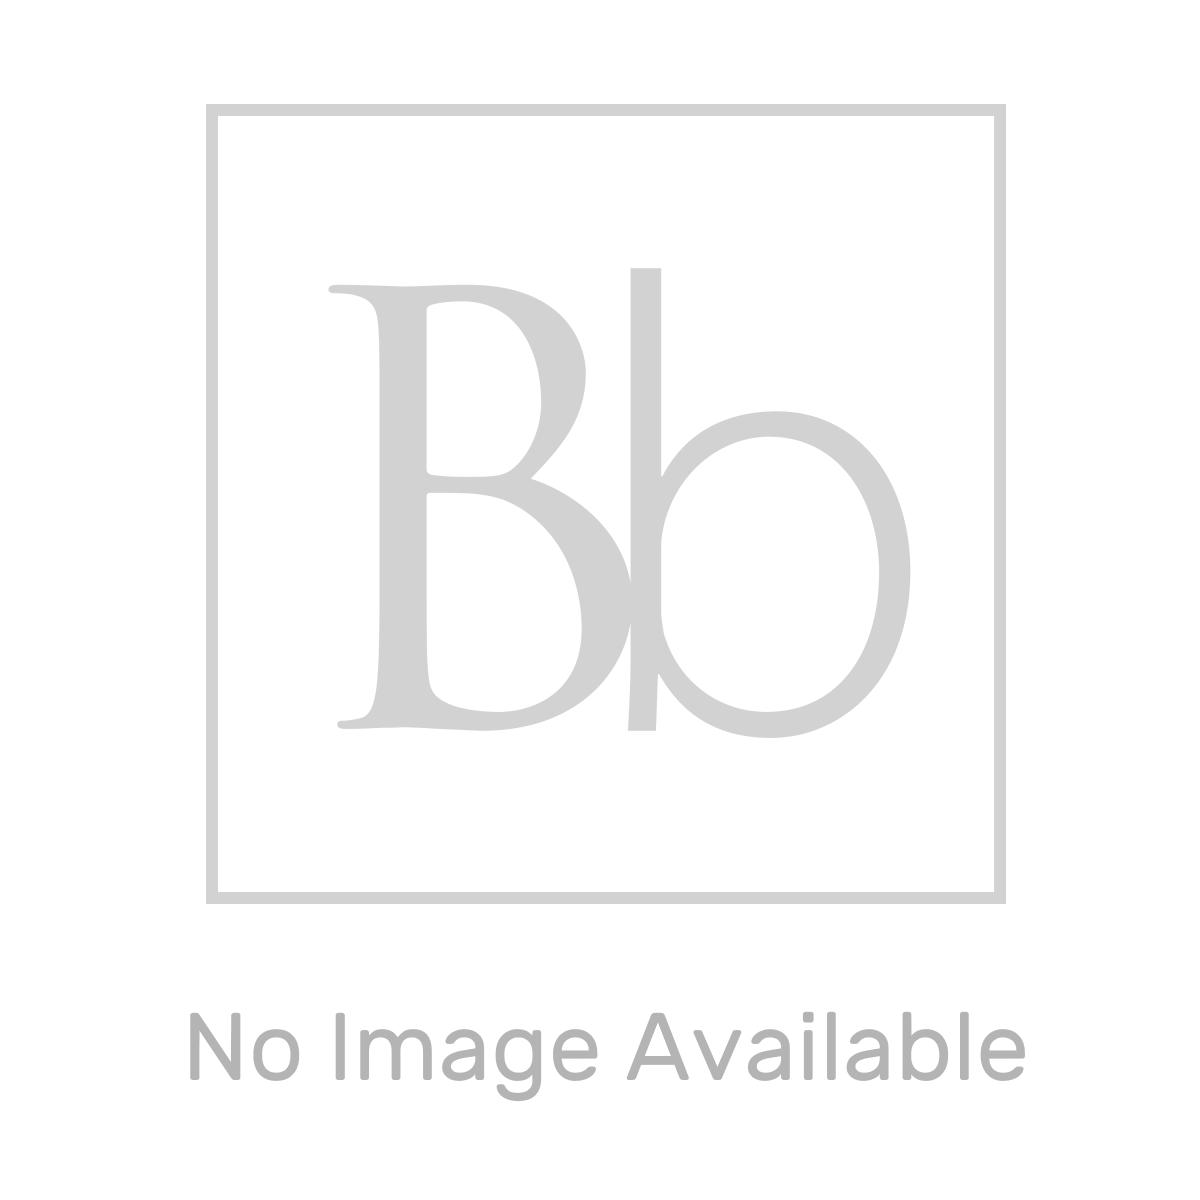 Premier Acrylic White End Bath Panel 700mm